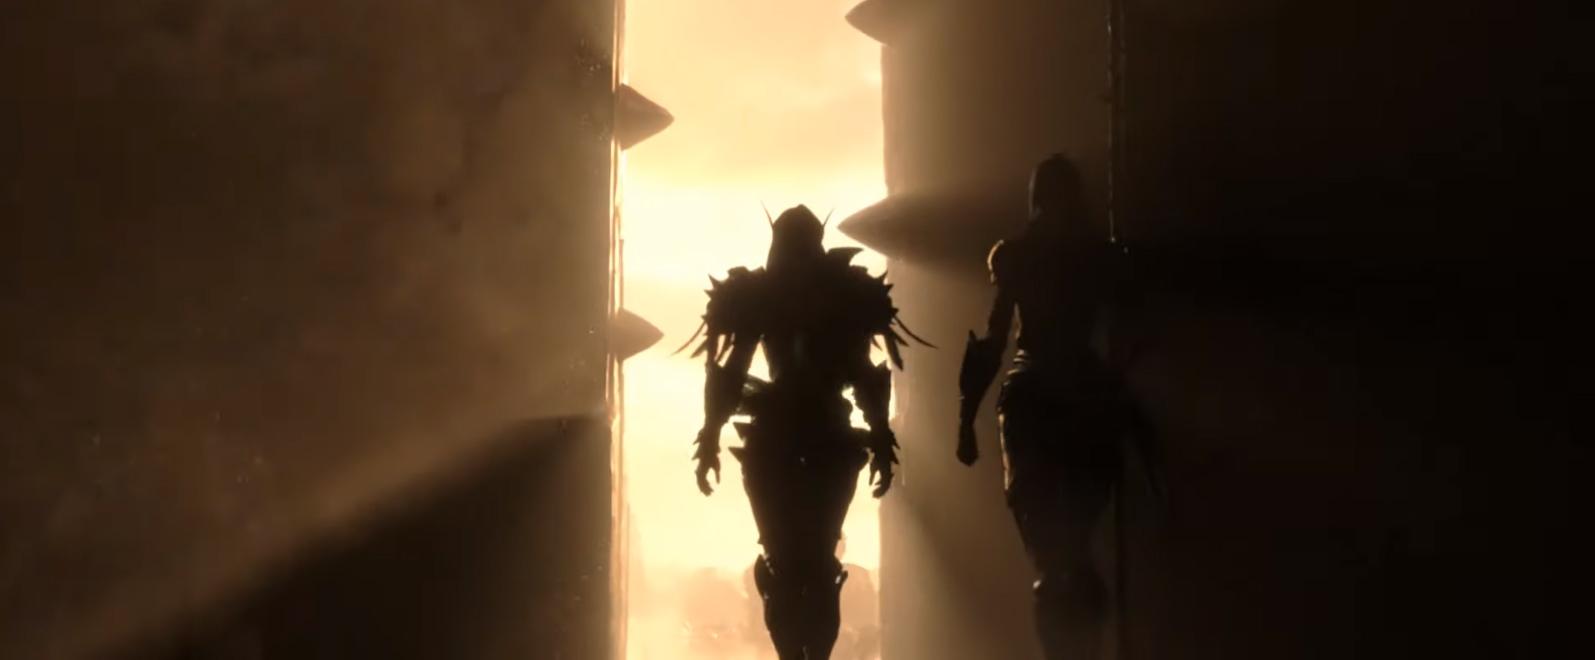 Sylvanas apparaît derrière les portes d'Orgrimmar